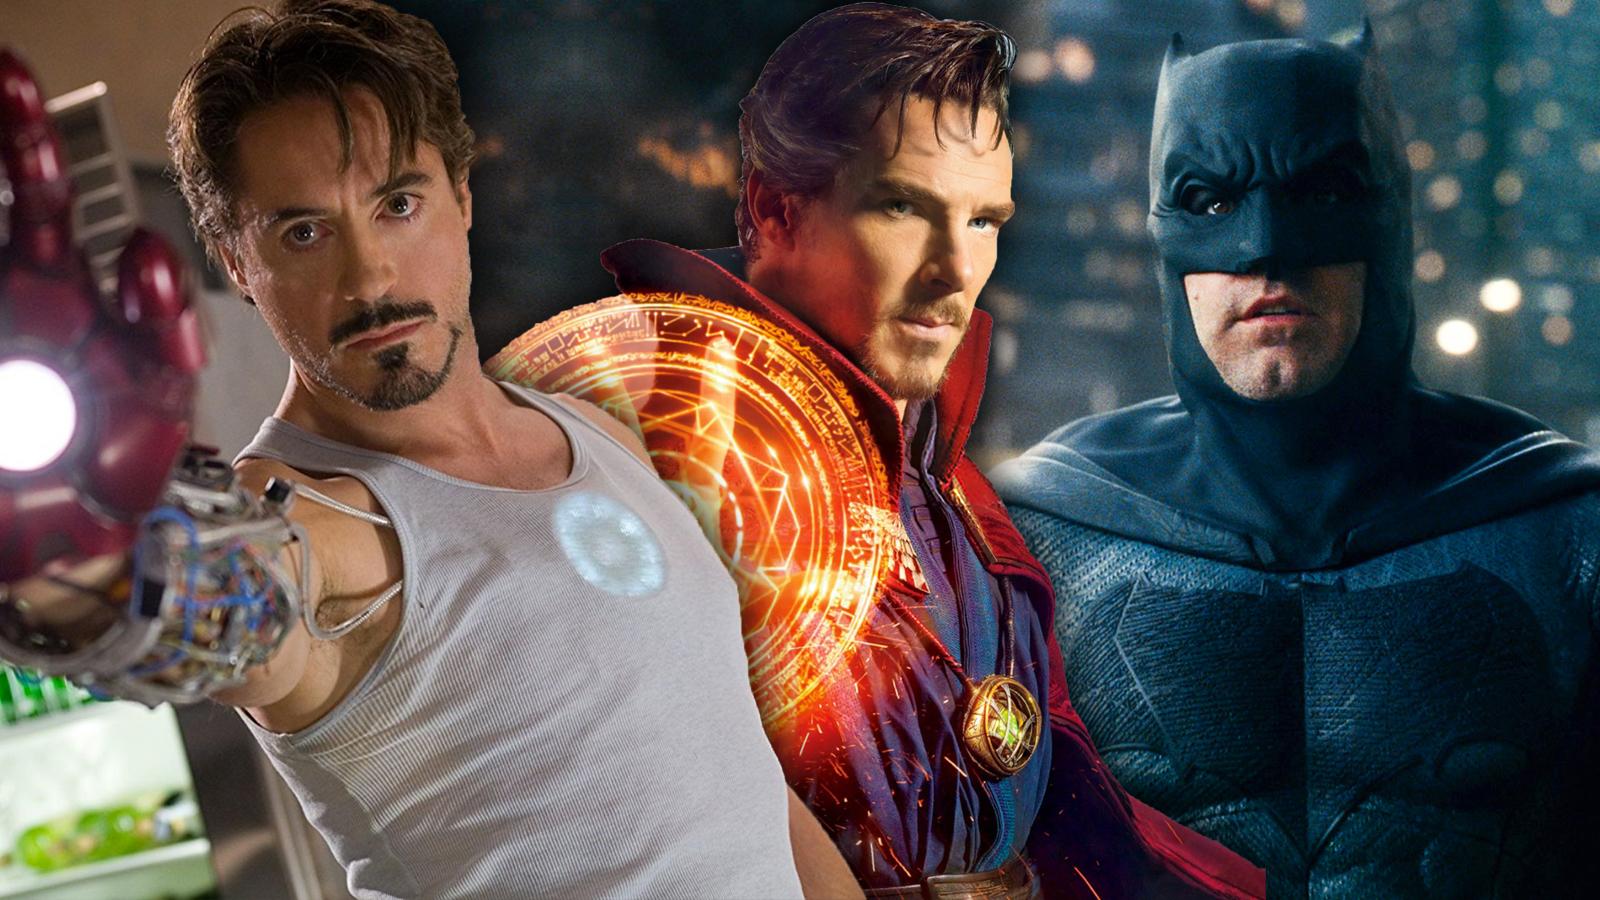 Iron Man Doctor Strange and Batman